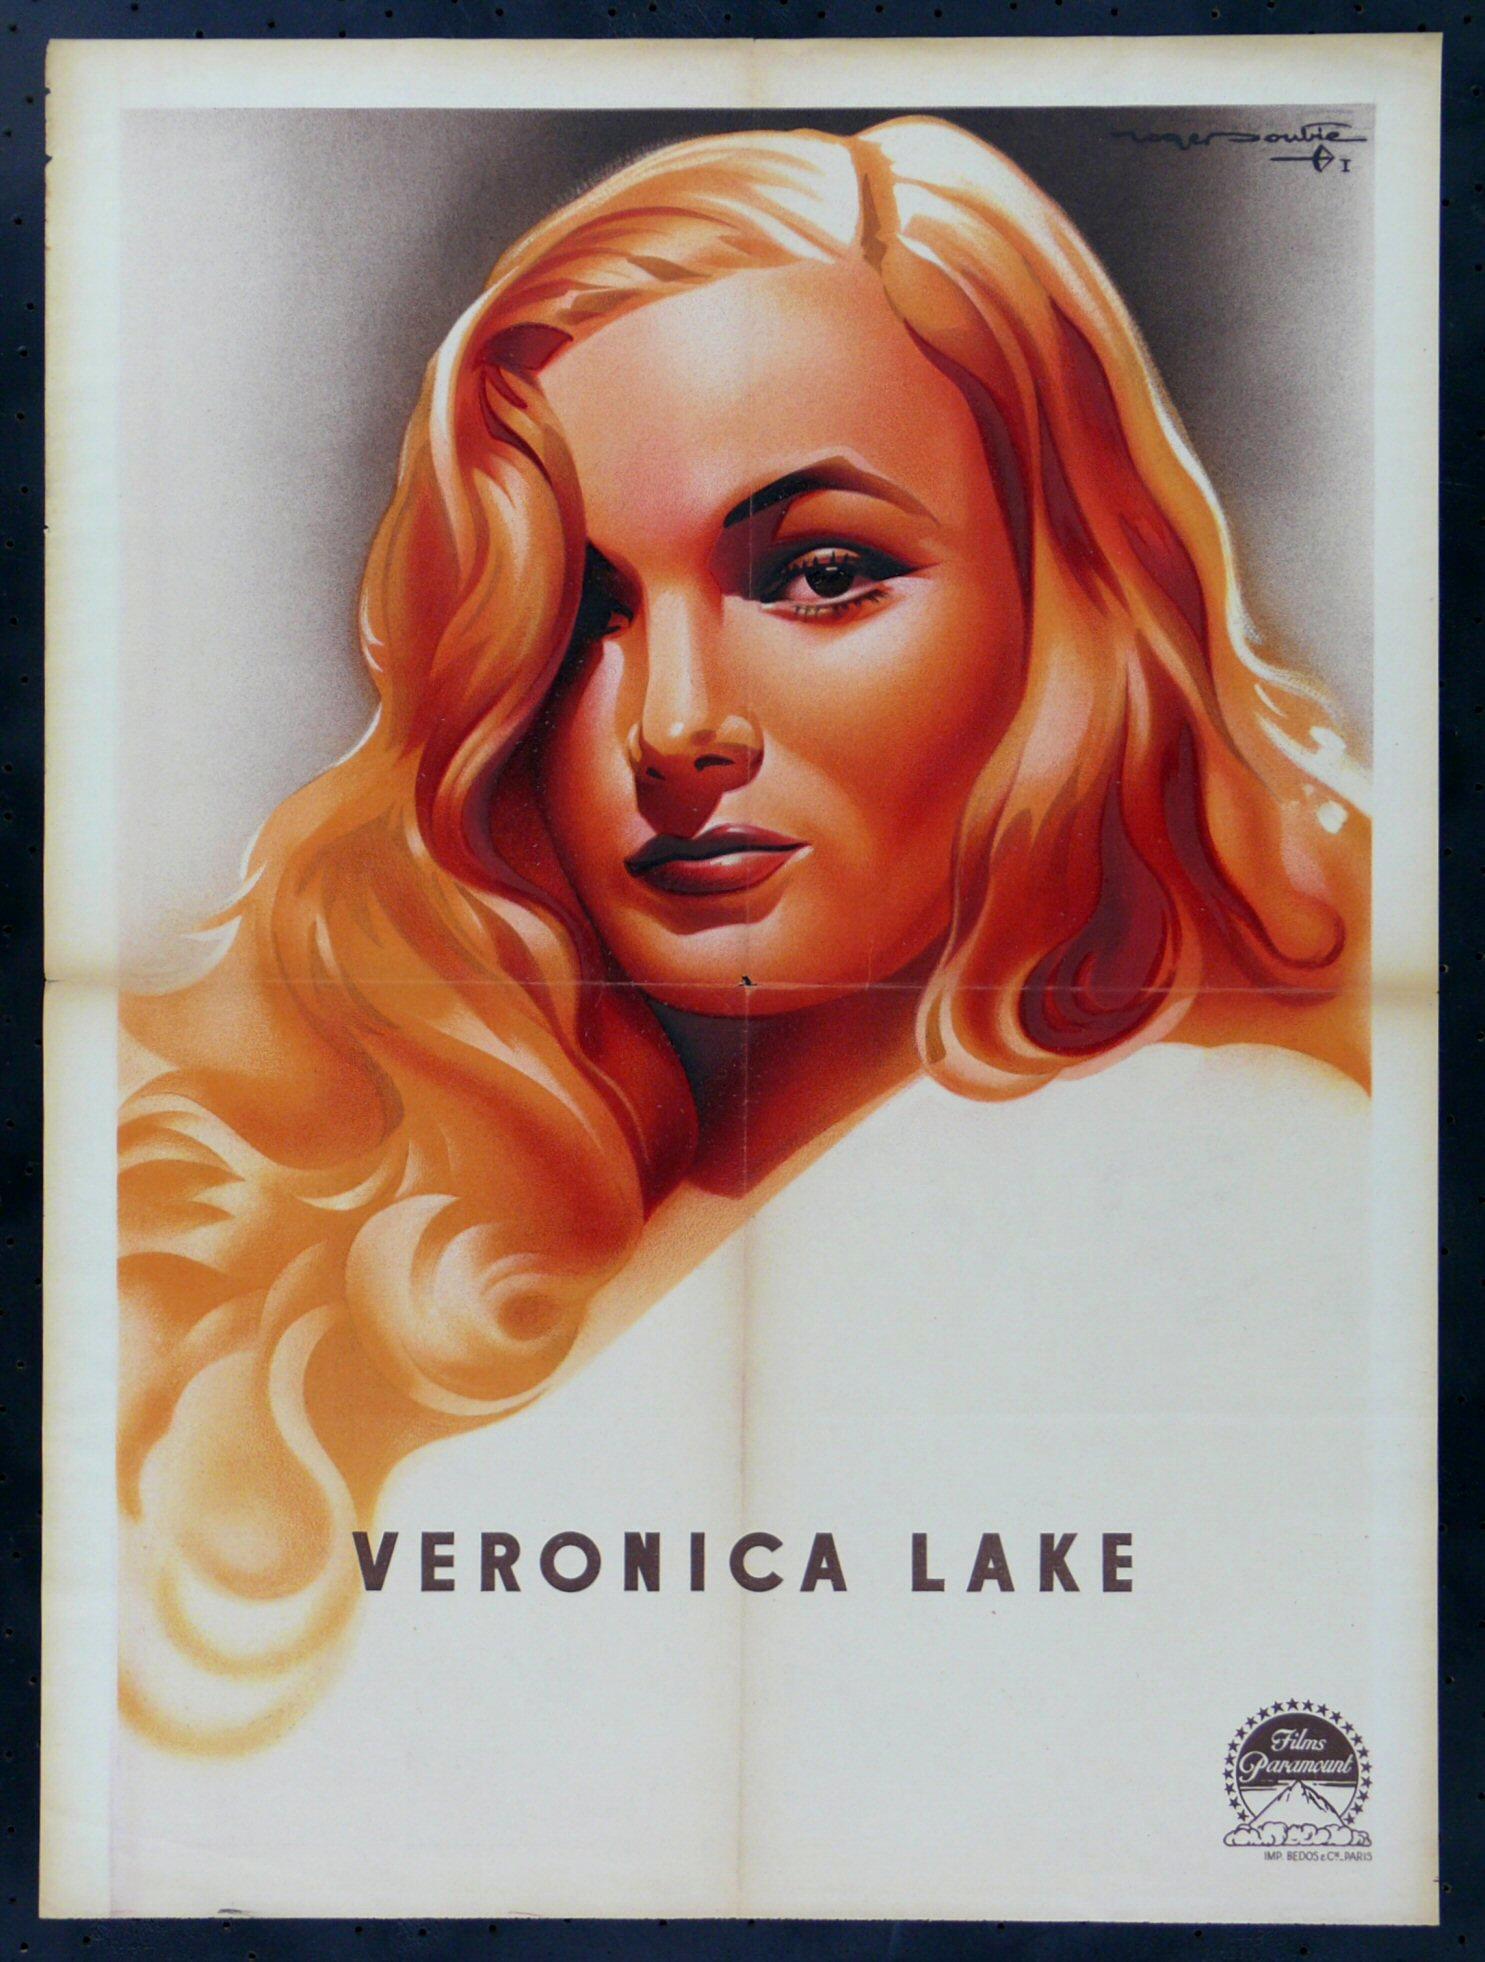 Vegas Vacation Movie Poster: Vertigo Viva Las Vegas Vacation Movie Posters